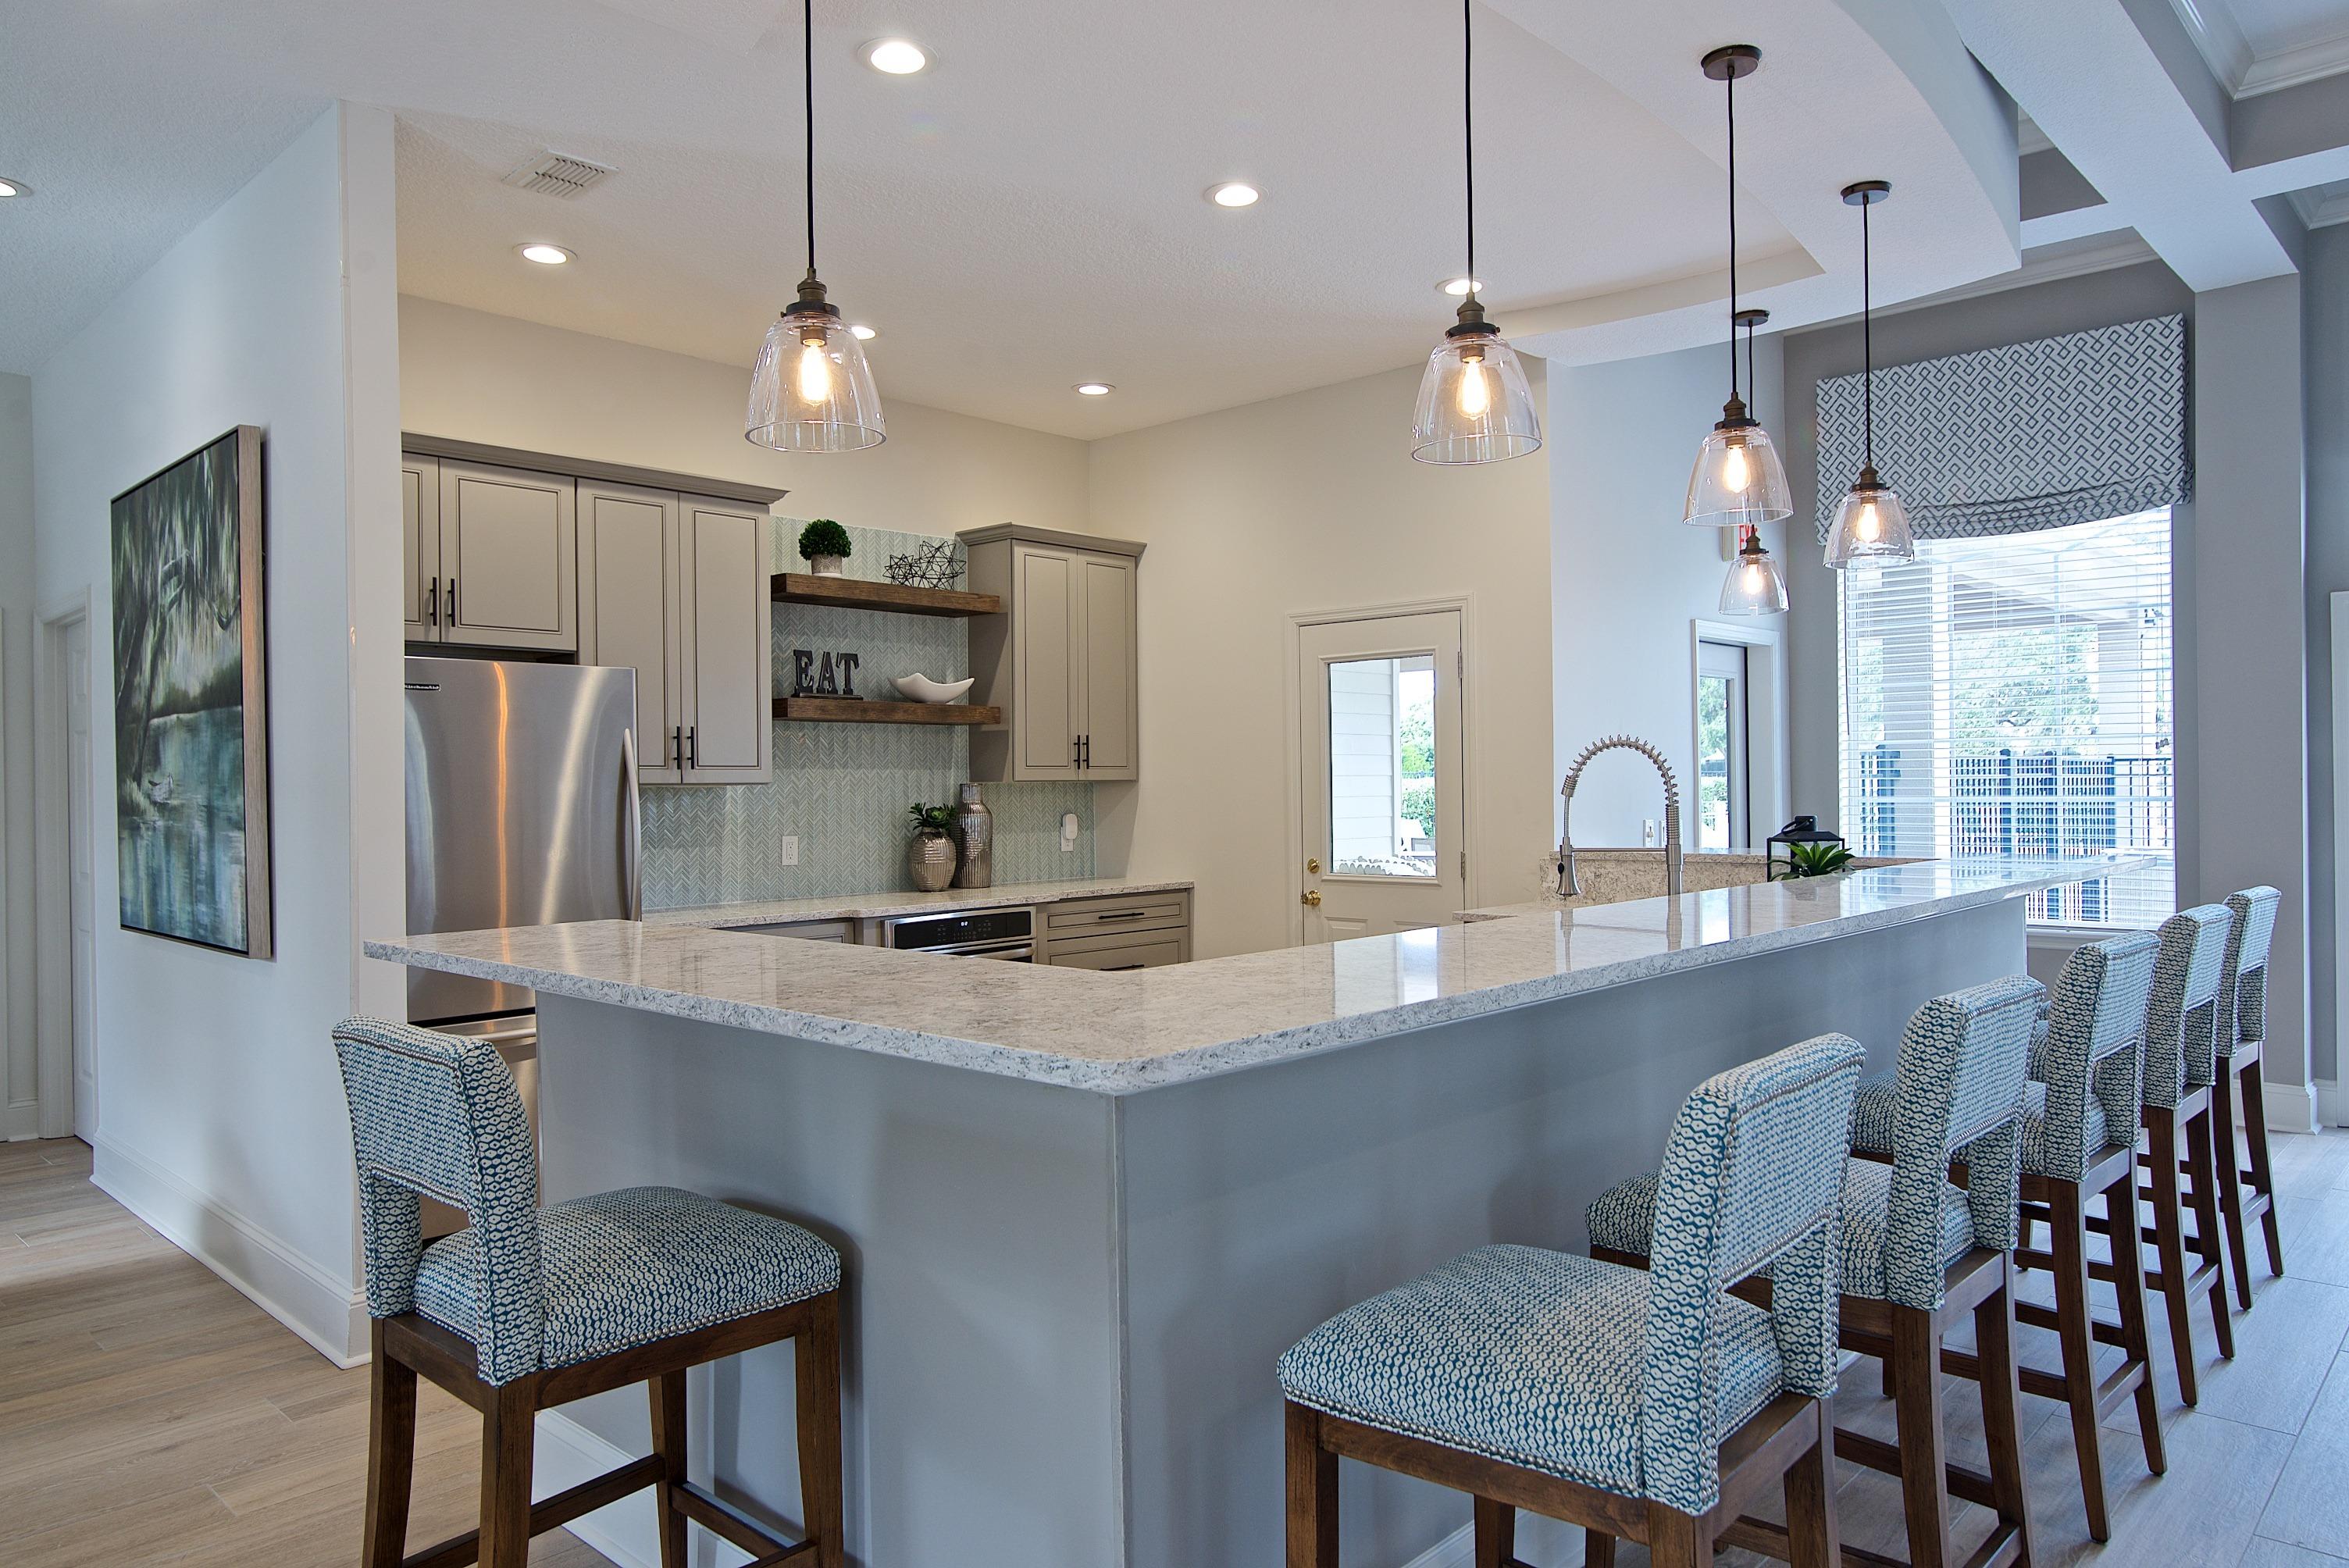 Shirley-Kishek-Interiors-Jacksonville-Florida-Interior-Decorating-Clubhouse-Revival-2